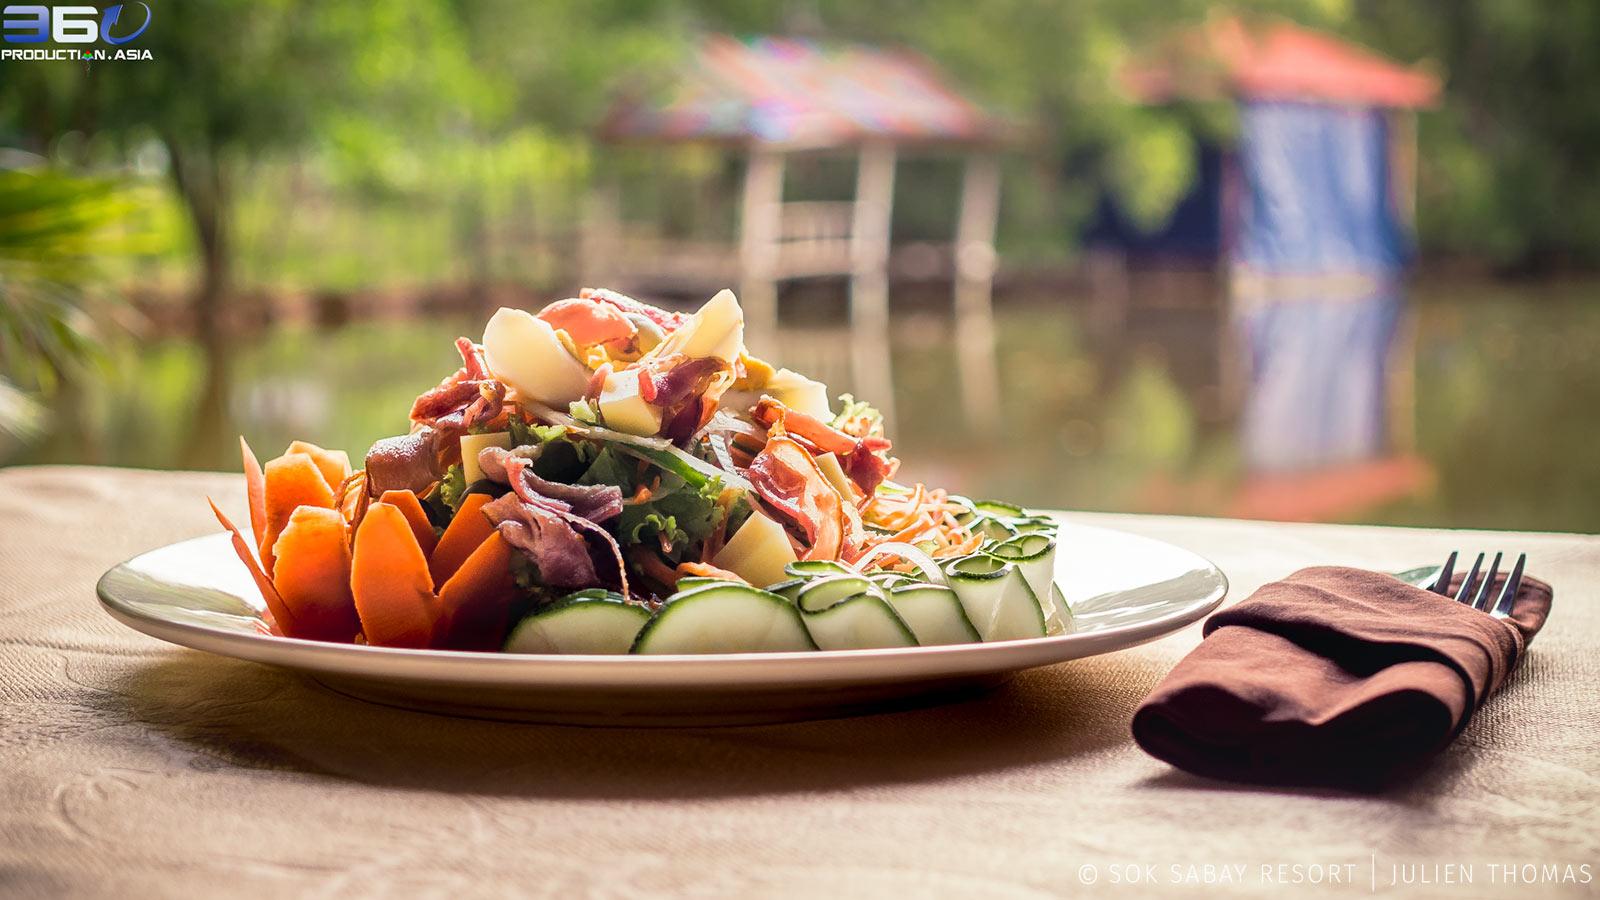 Chef's salad.